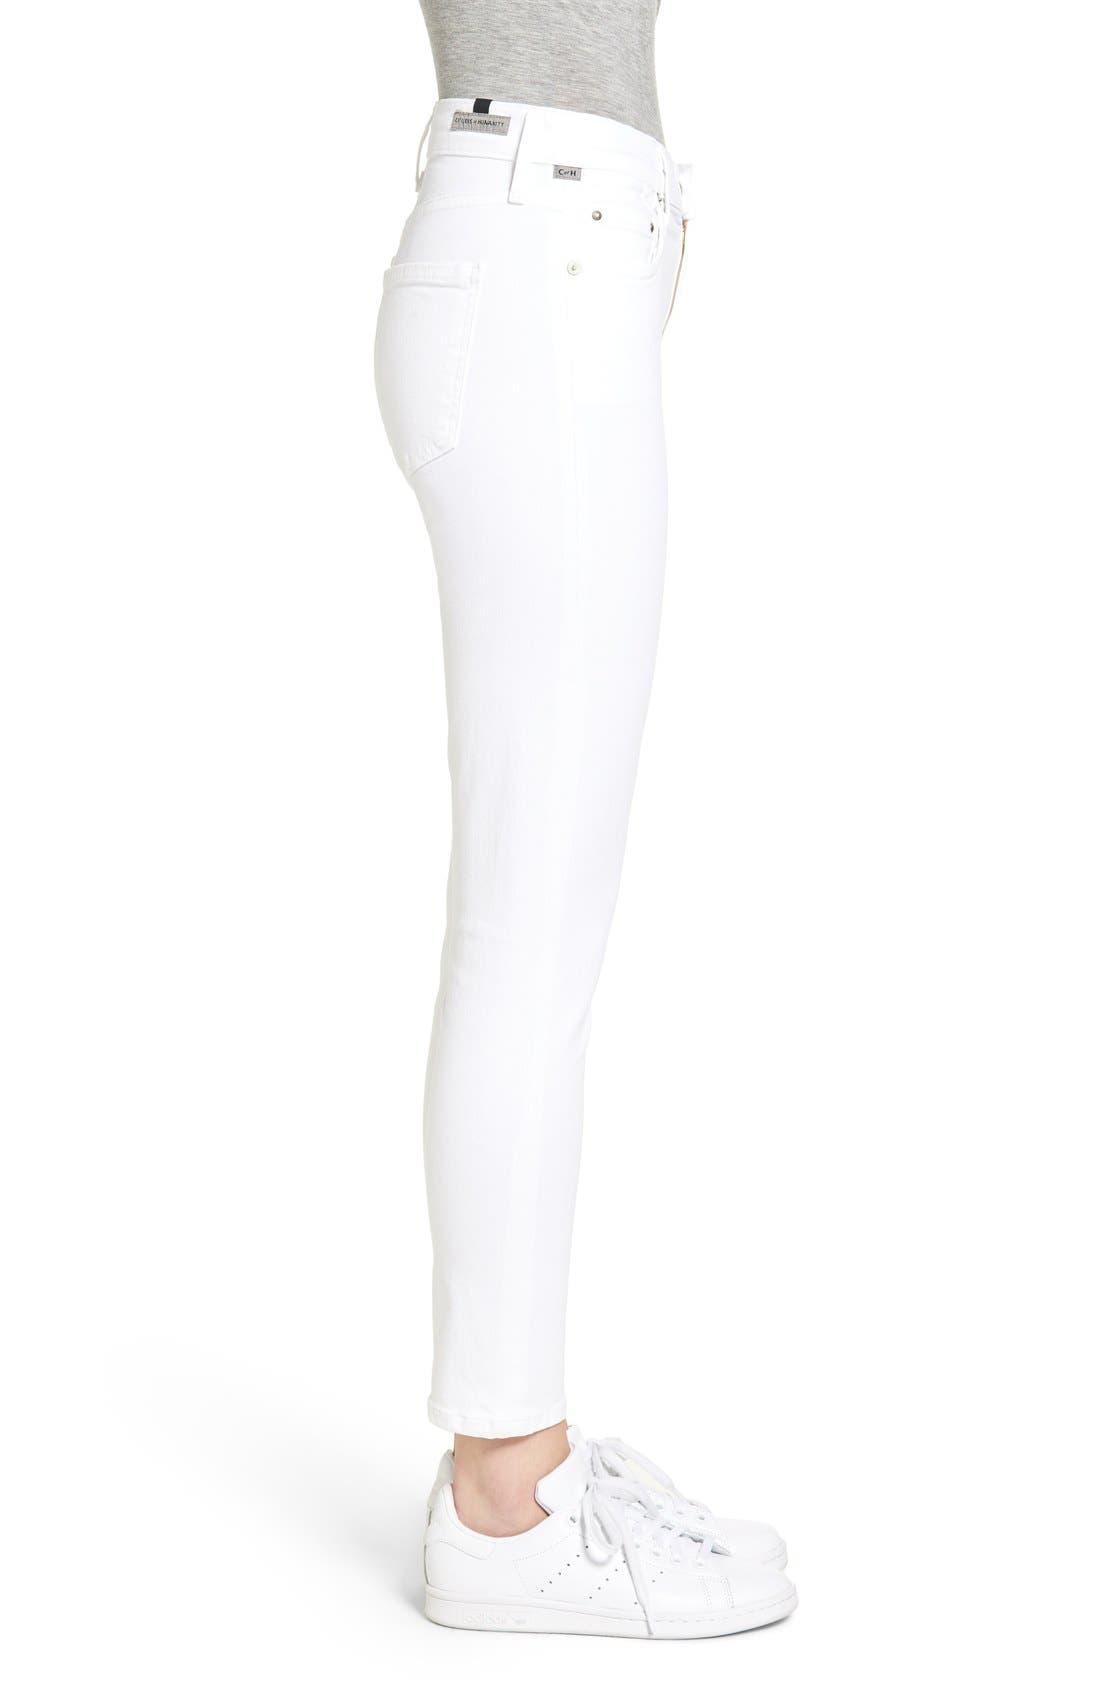 Rocket High Waist Crop Skinny Jeans,                             Alternate thumbnail 3, color,                             SCULPT WHITE